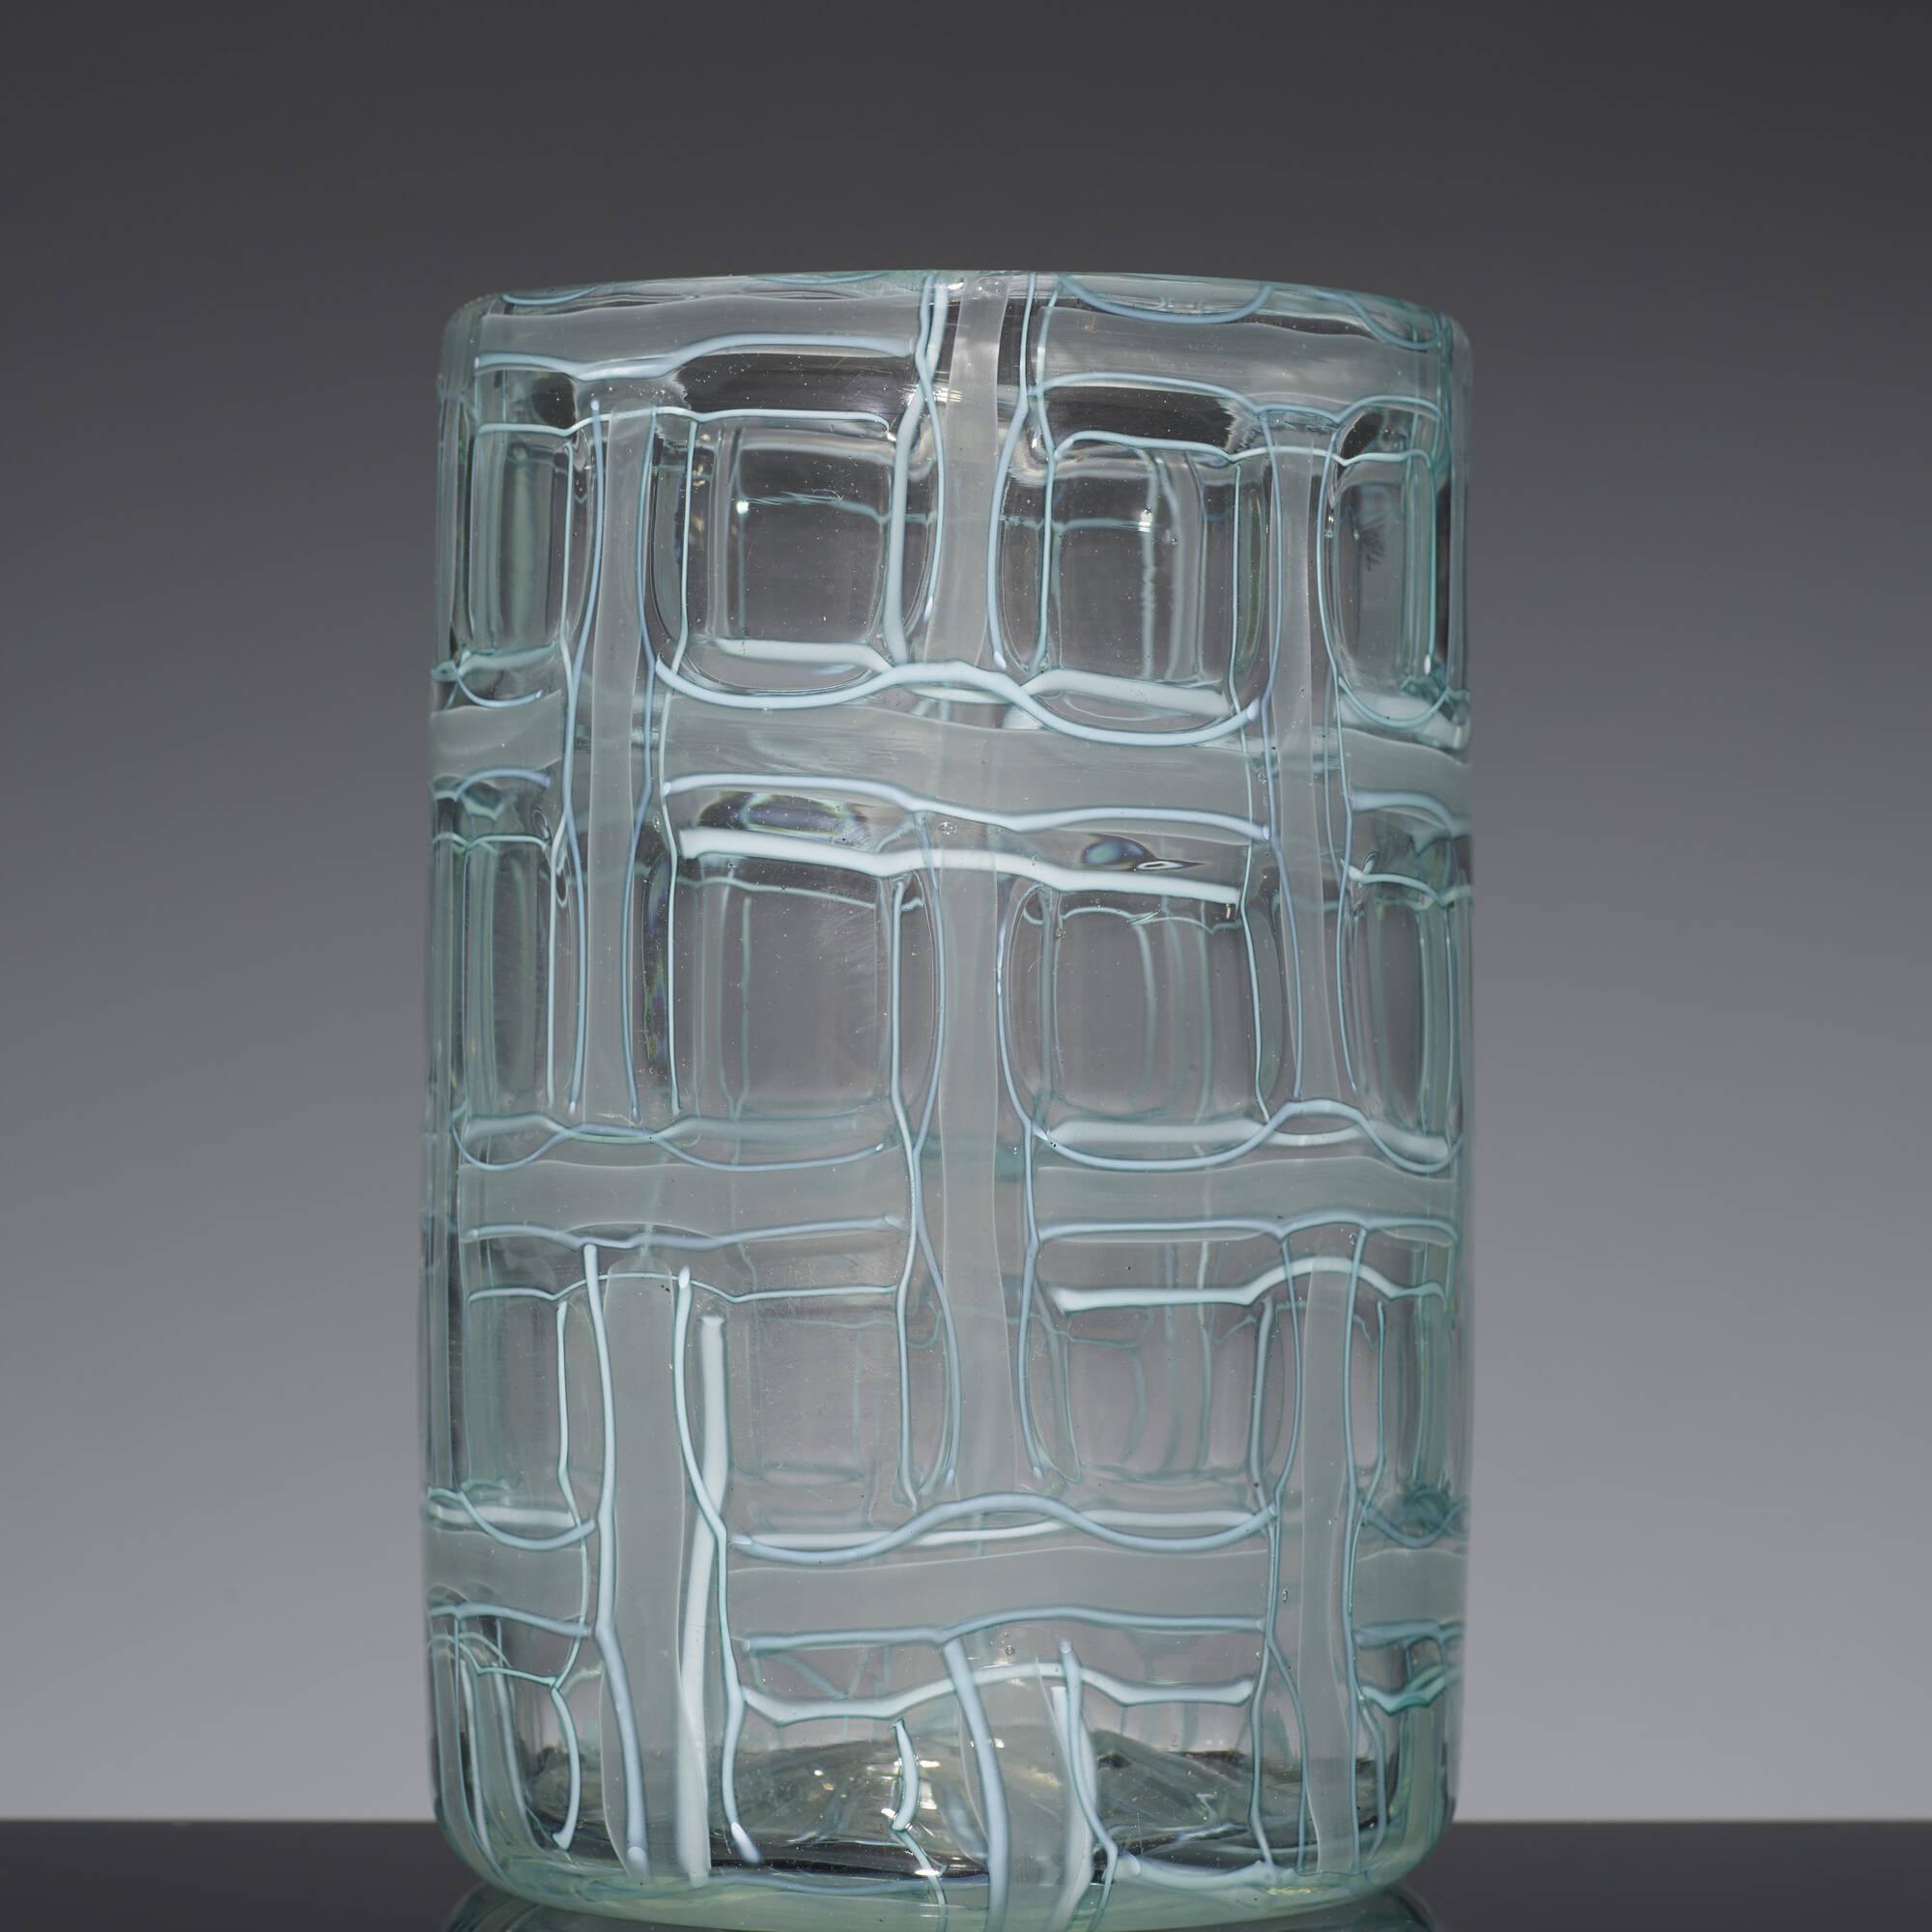 175: Ercole Barovier / Argo vase (2 of 3)